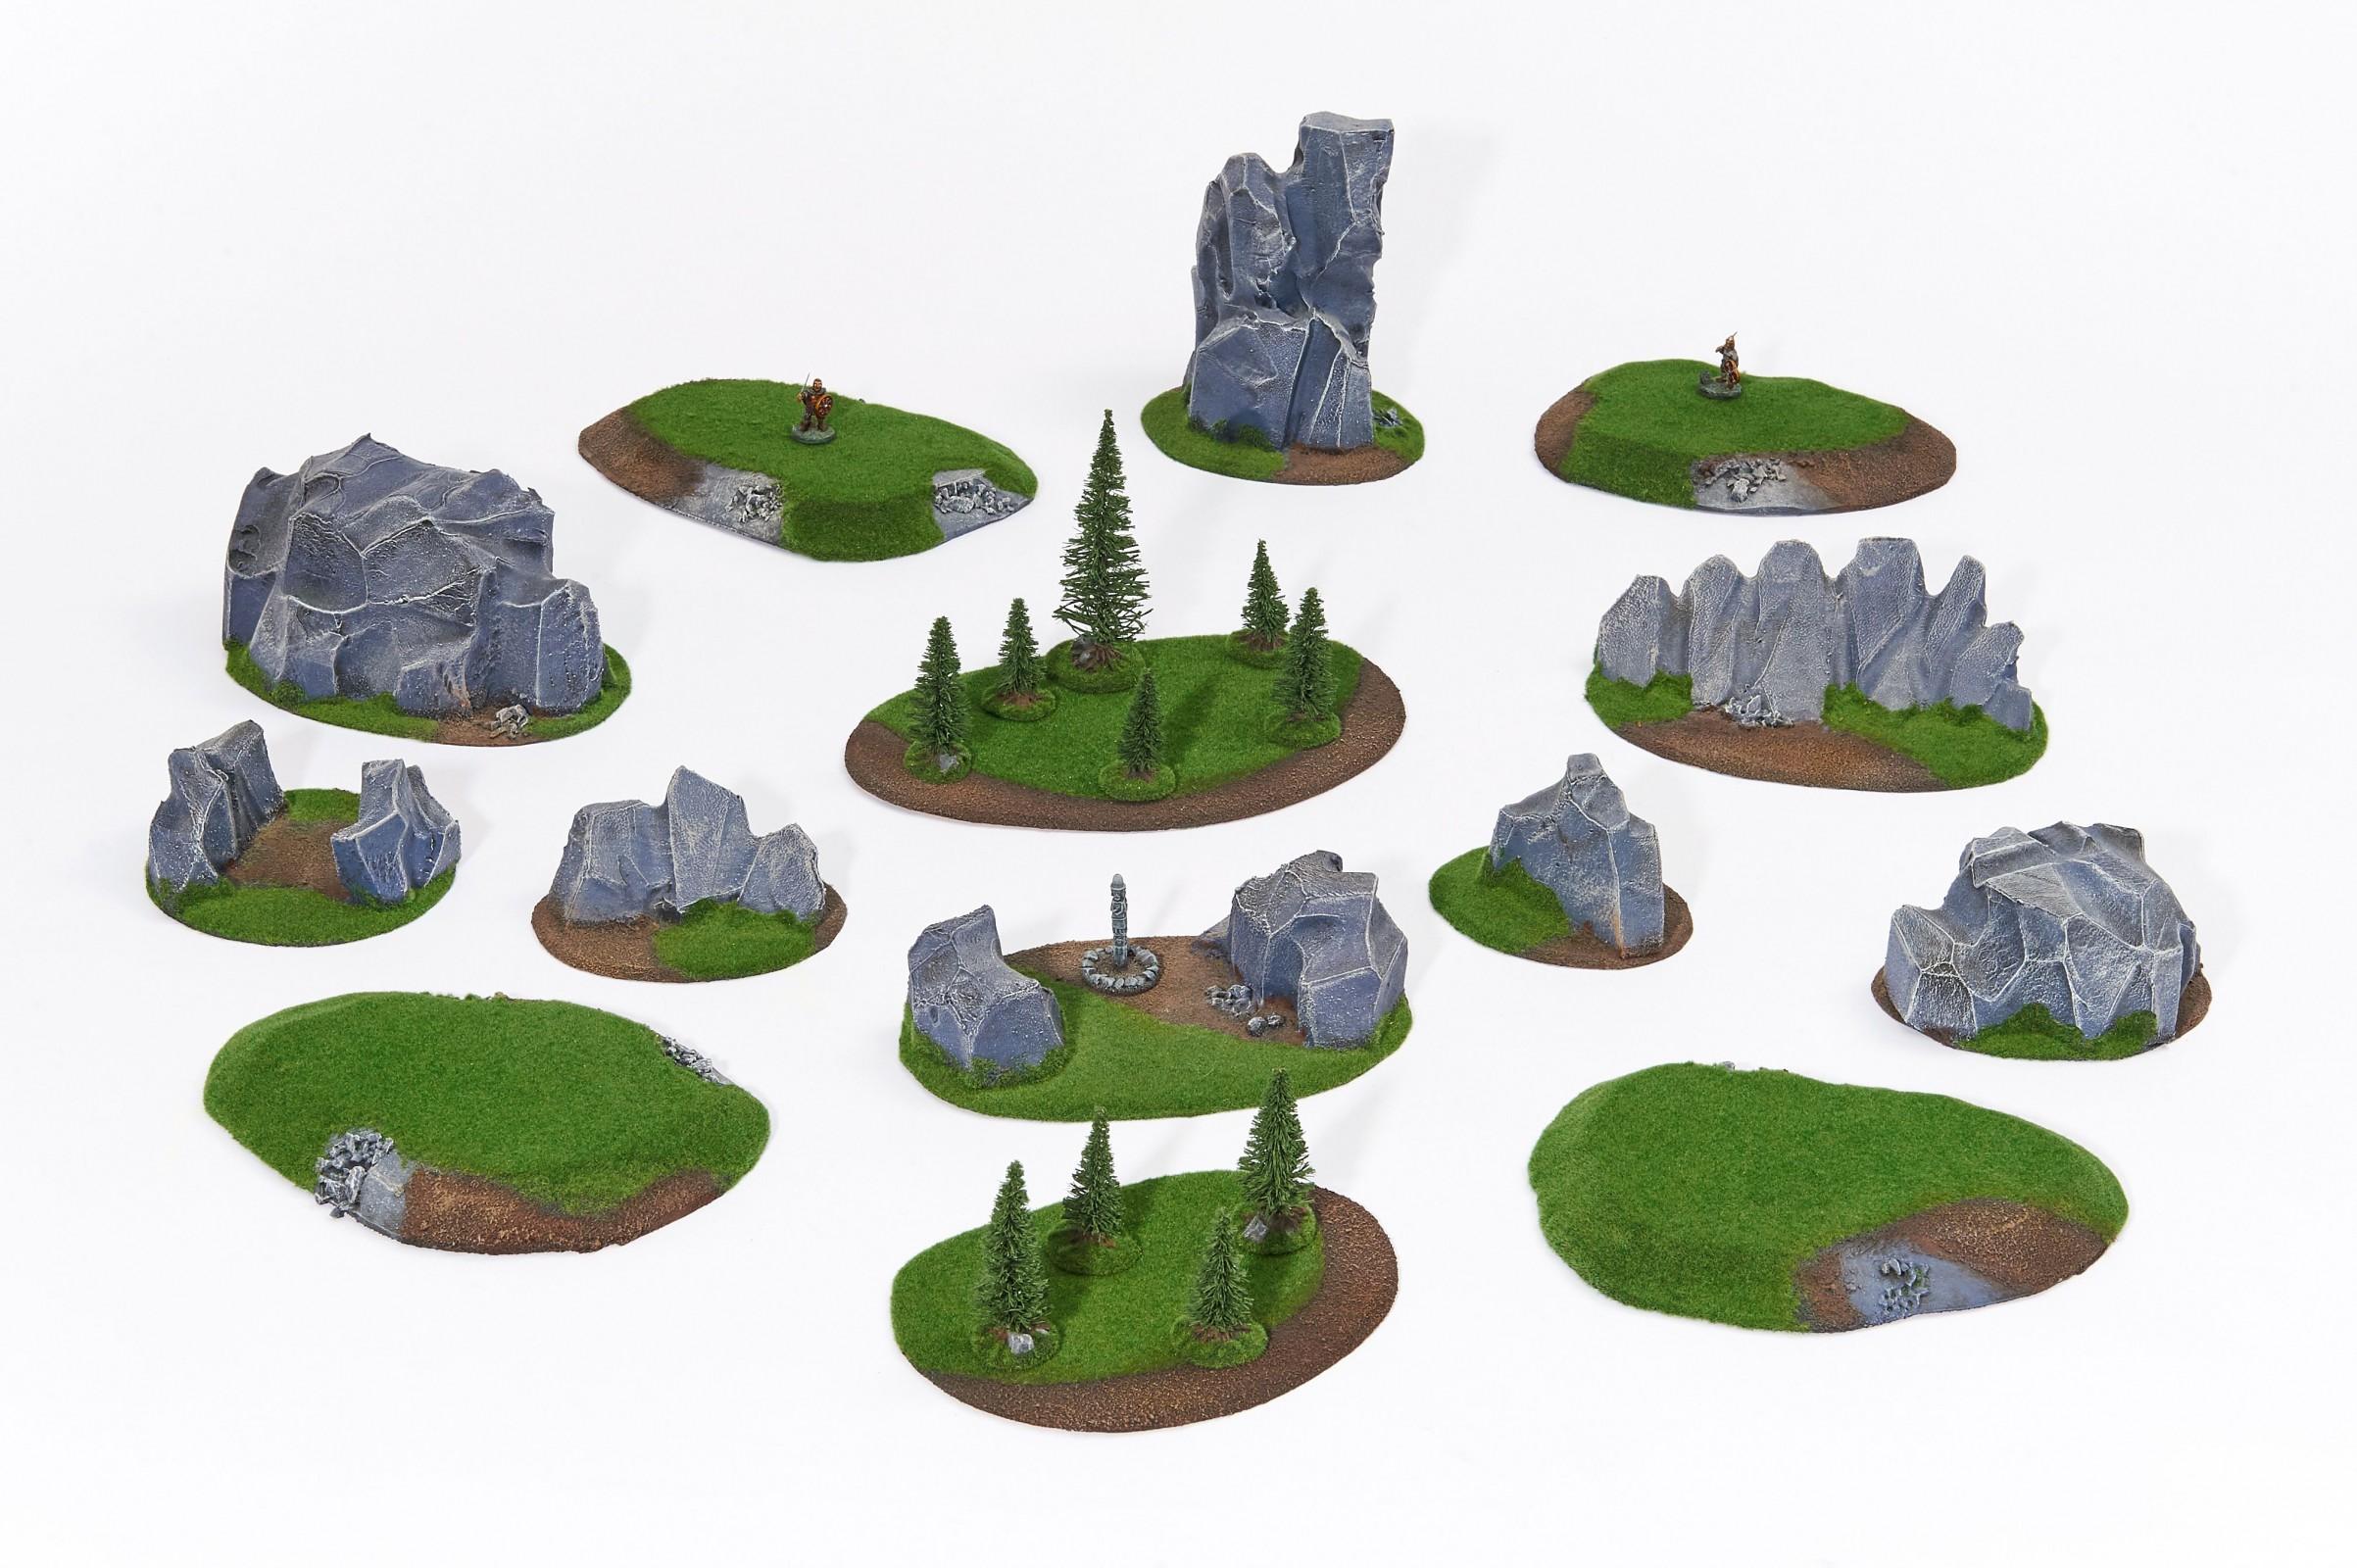 LARGE Standard Battlefield Set - 15 elements